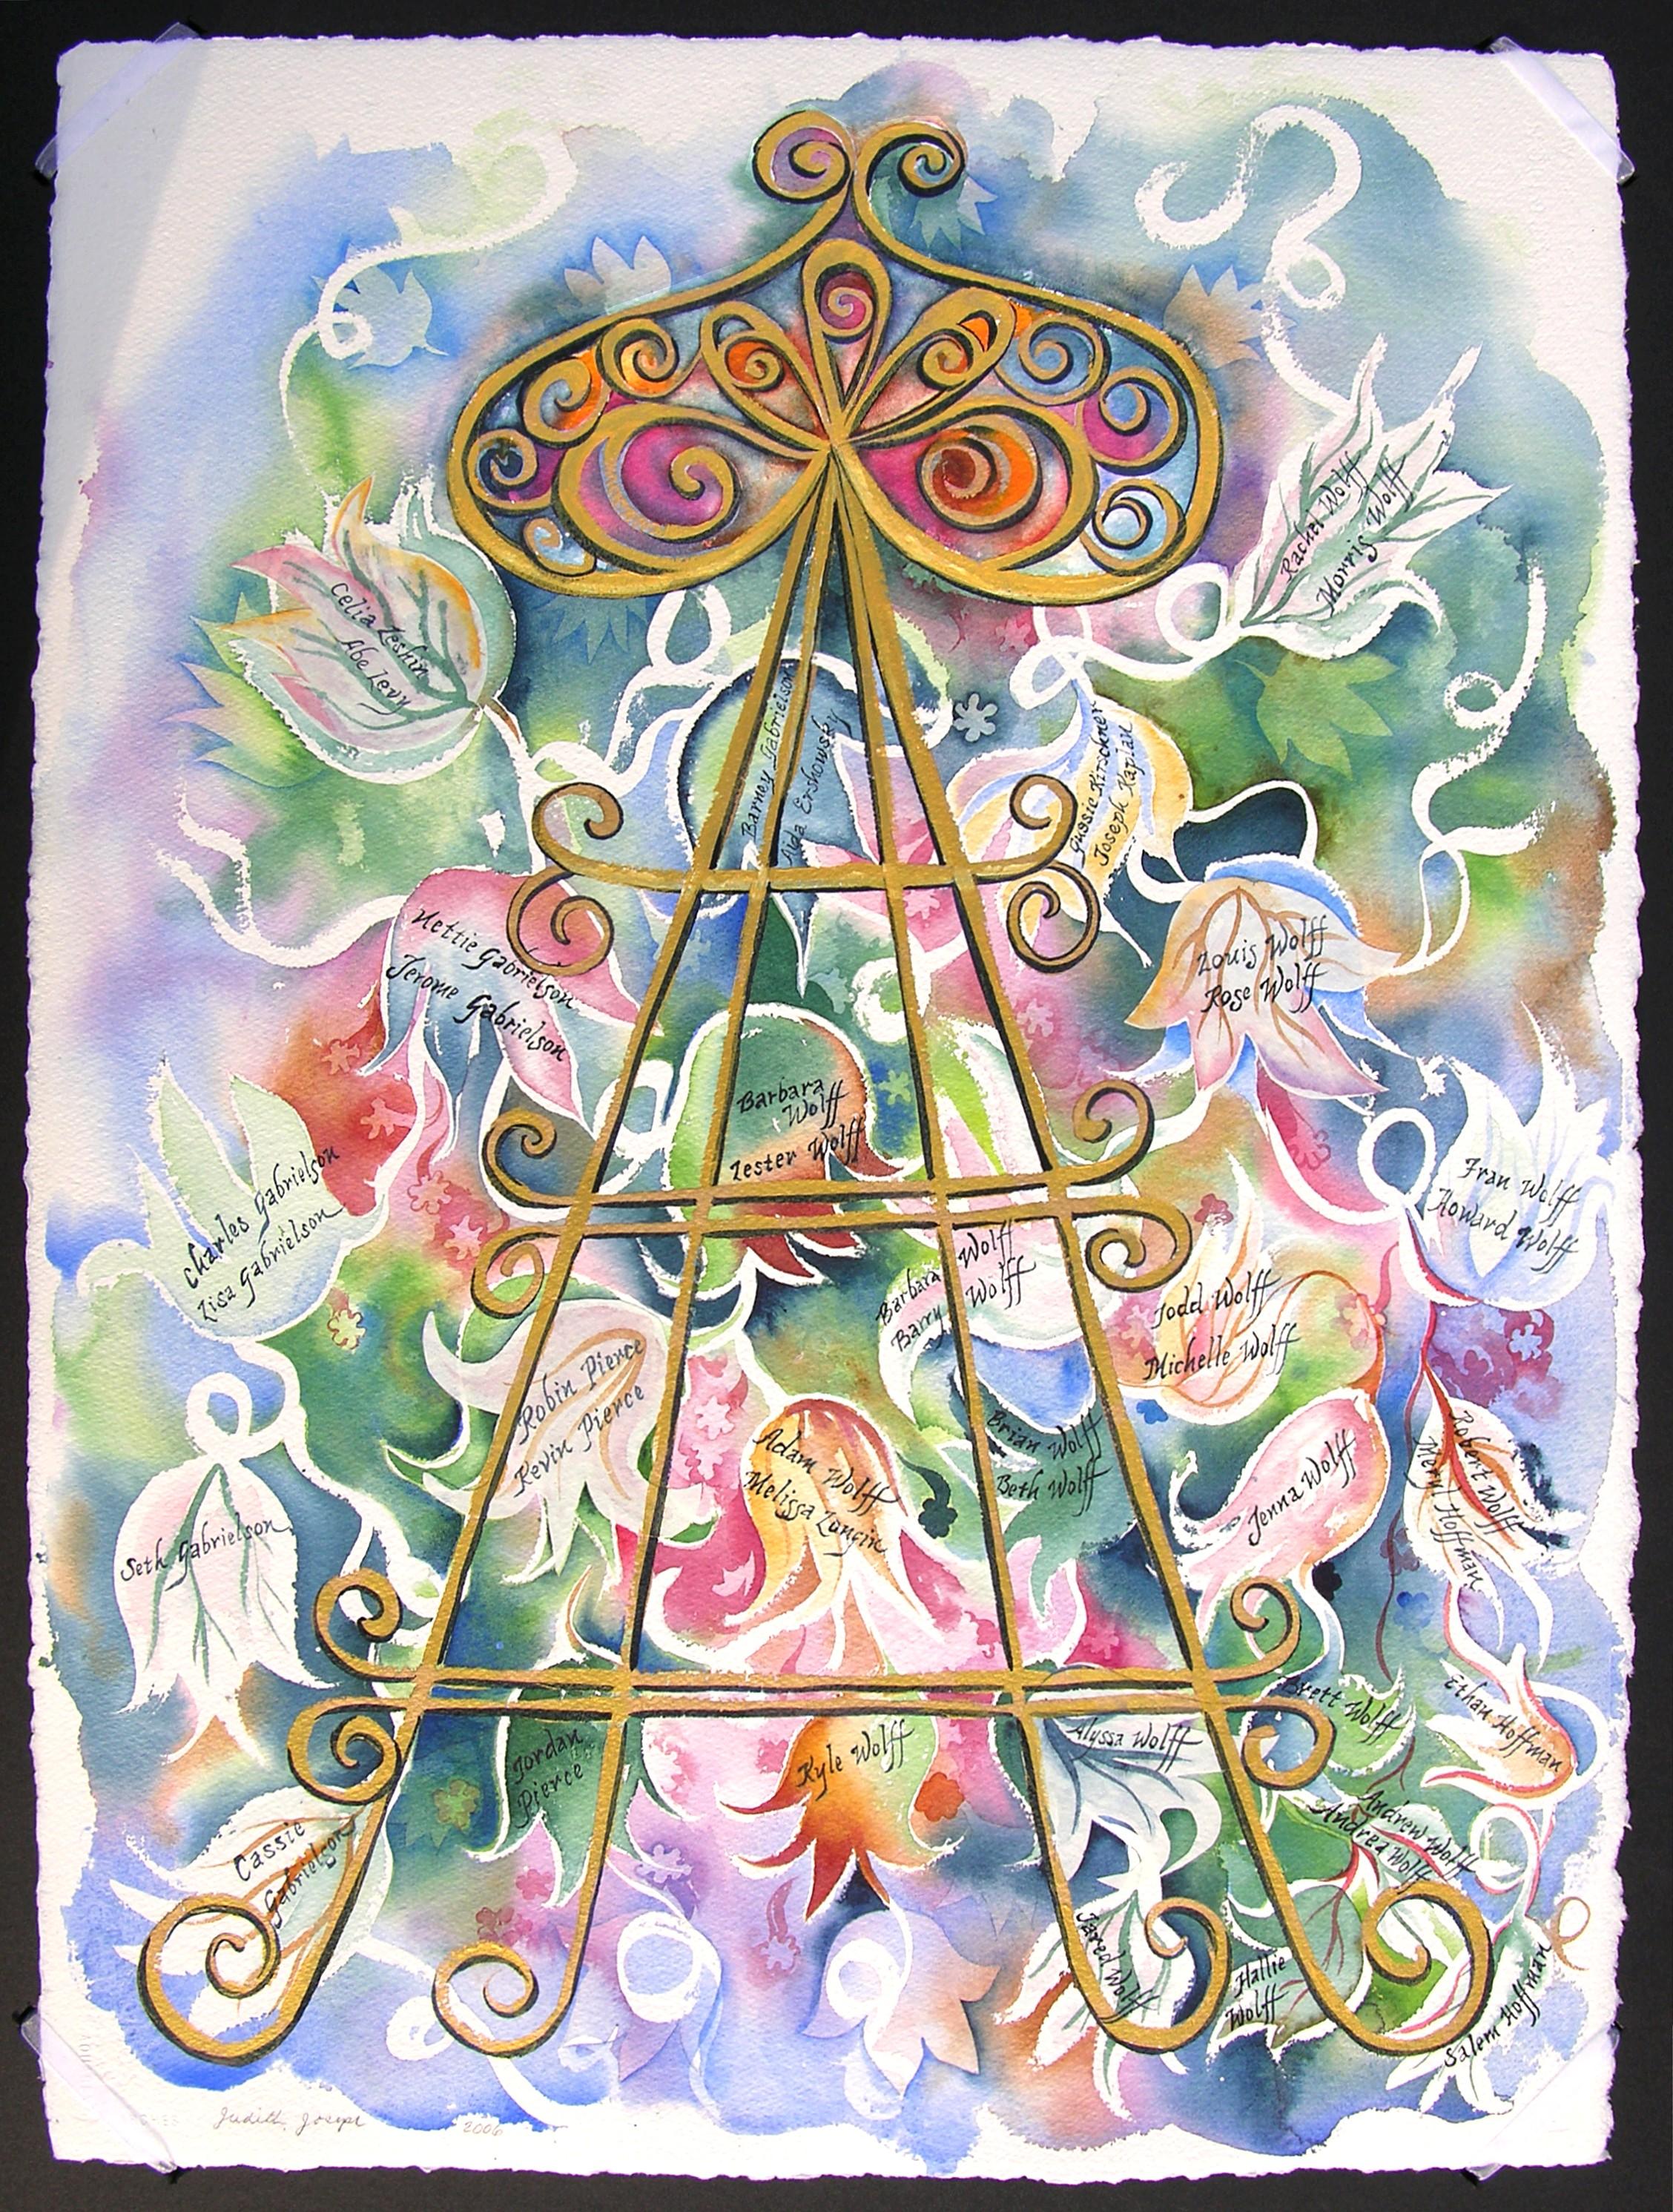 Trellis Family Tree, 2006